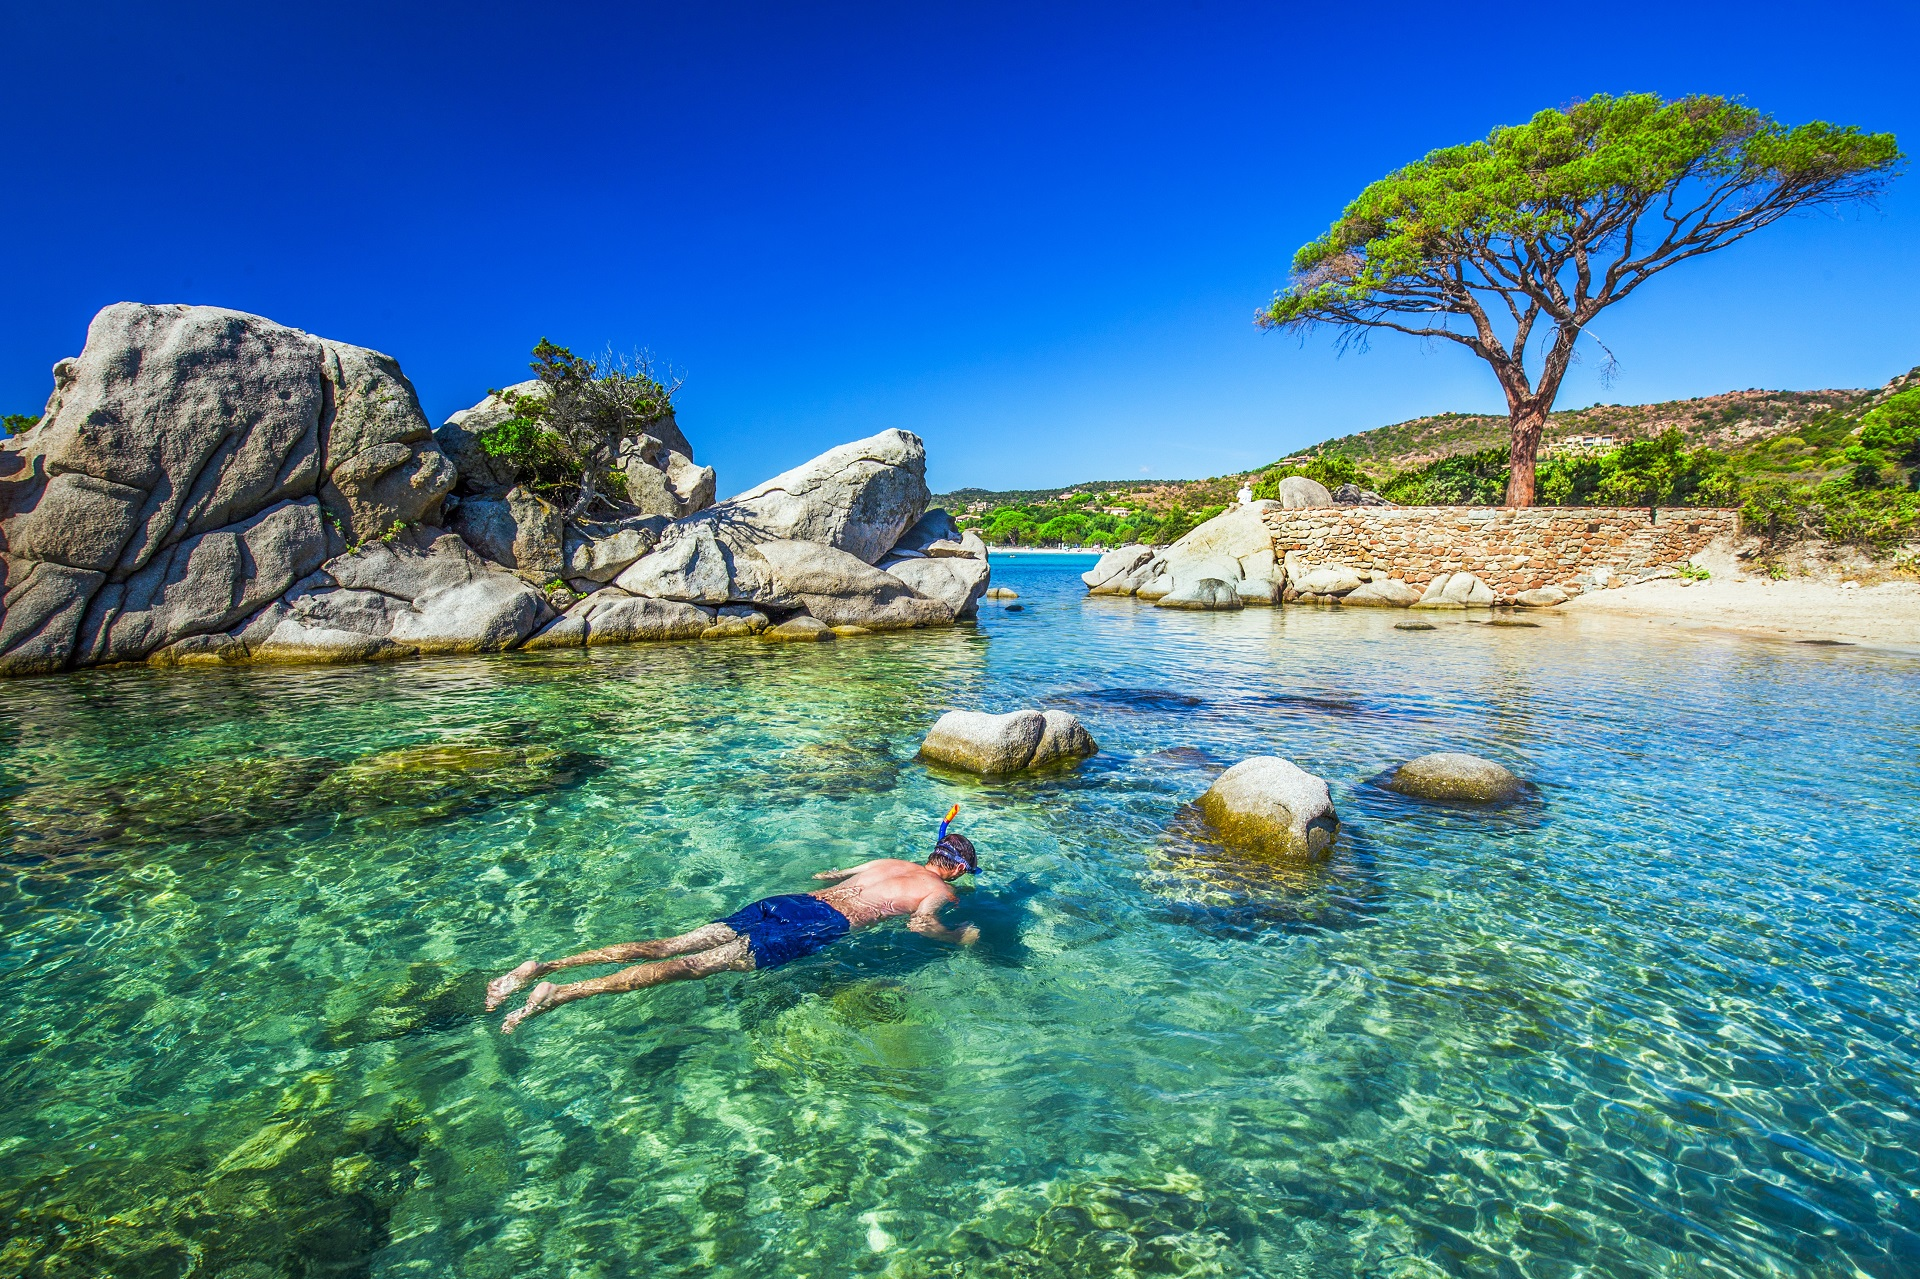 Plage De Palombaggia Korsika Hotel